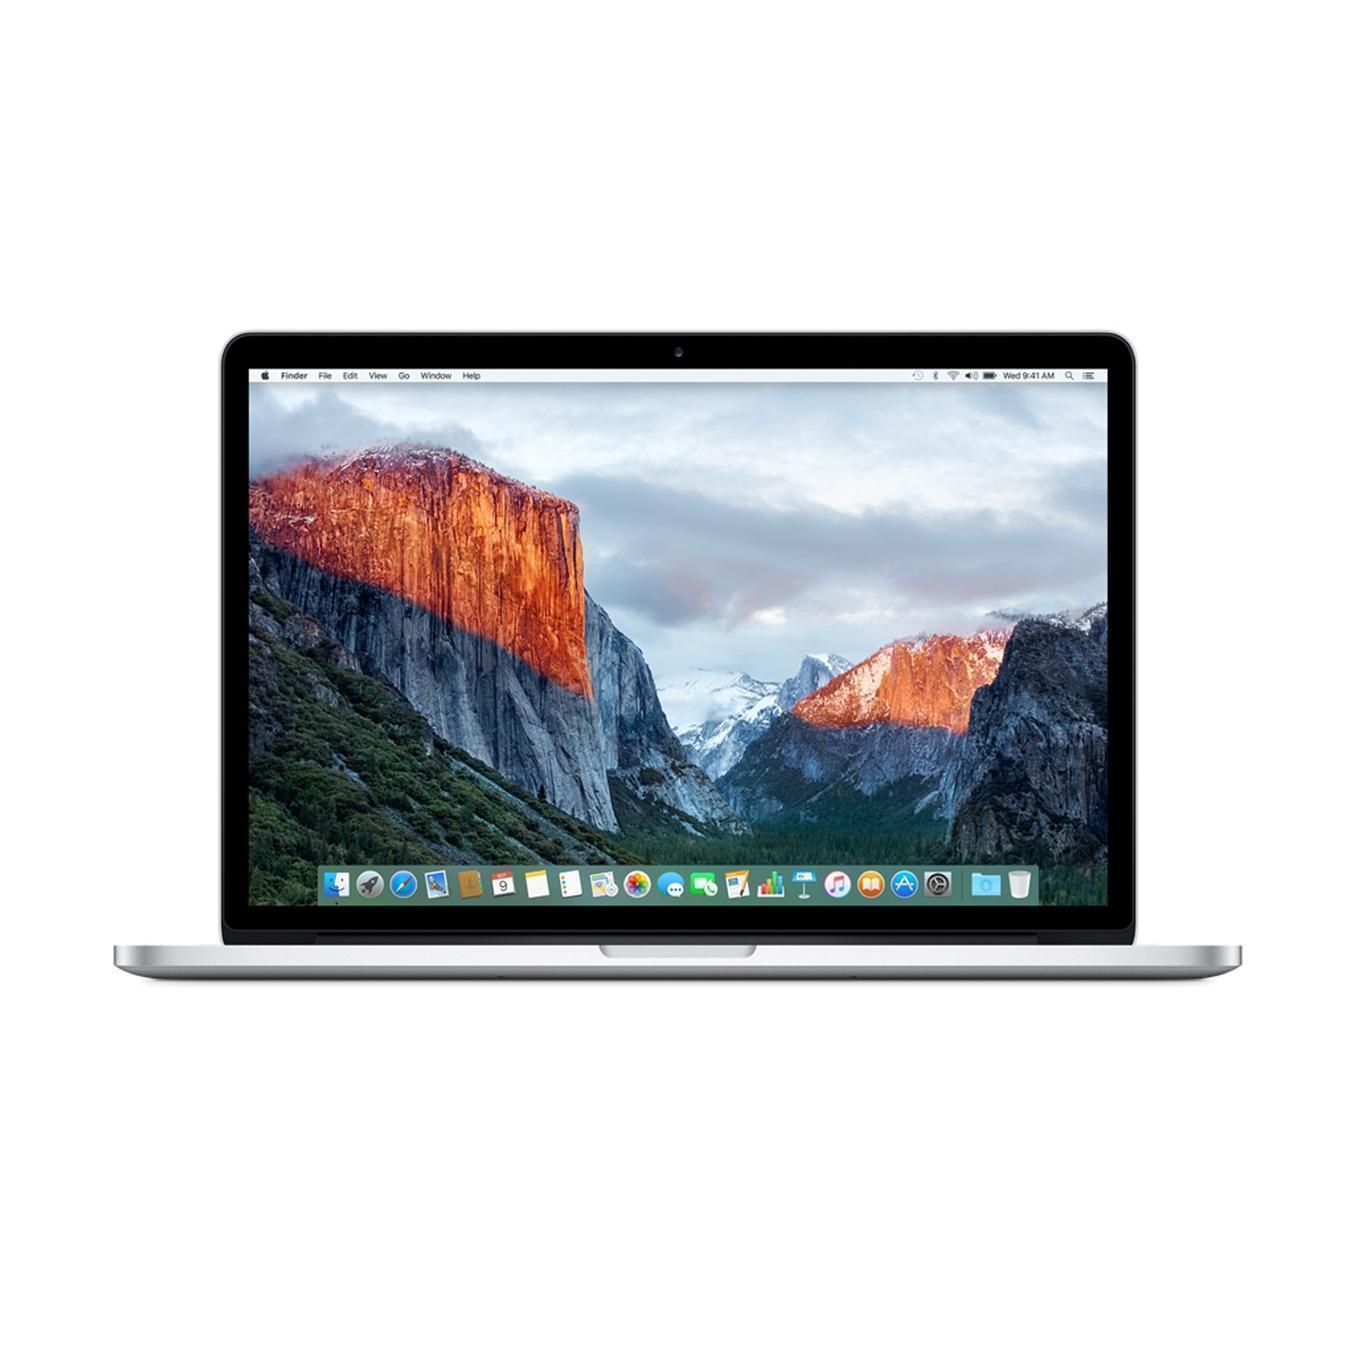 MacBook Pro Retina 15.4-inch (2012) - Core i7 - 16GB - SSD 256 GB AZERTY - French